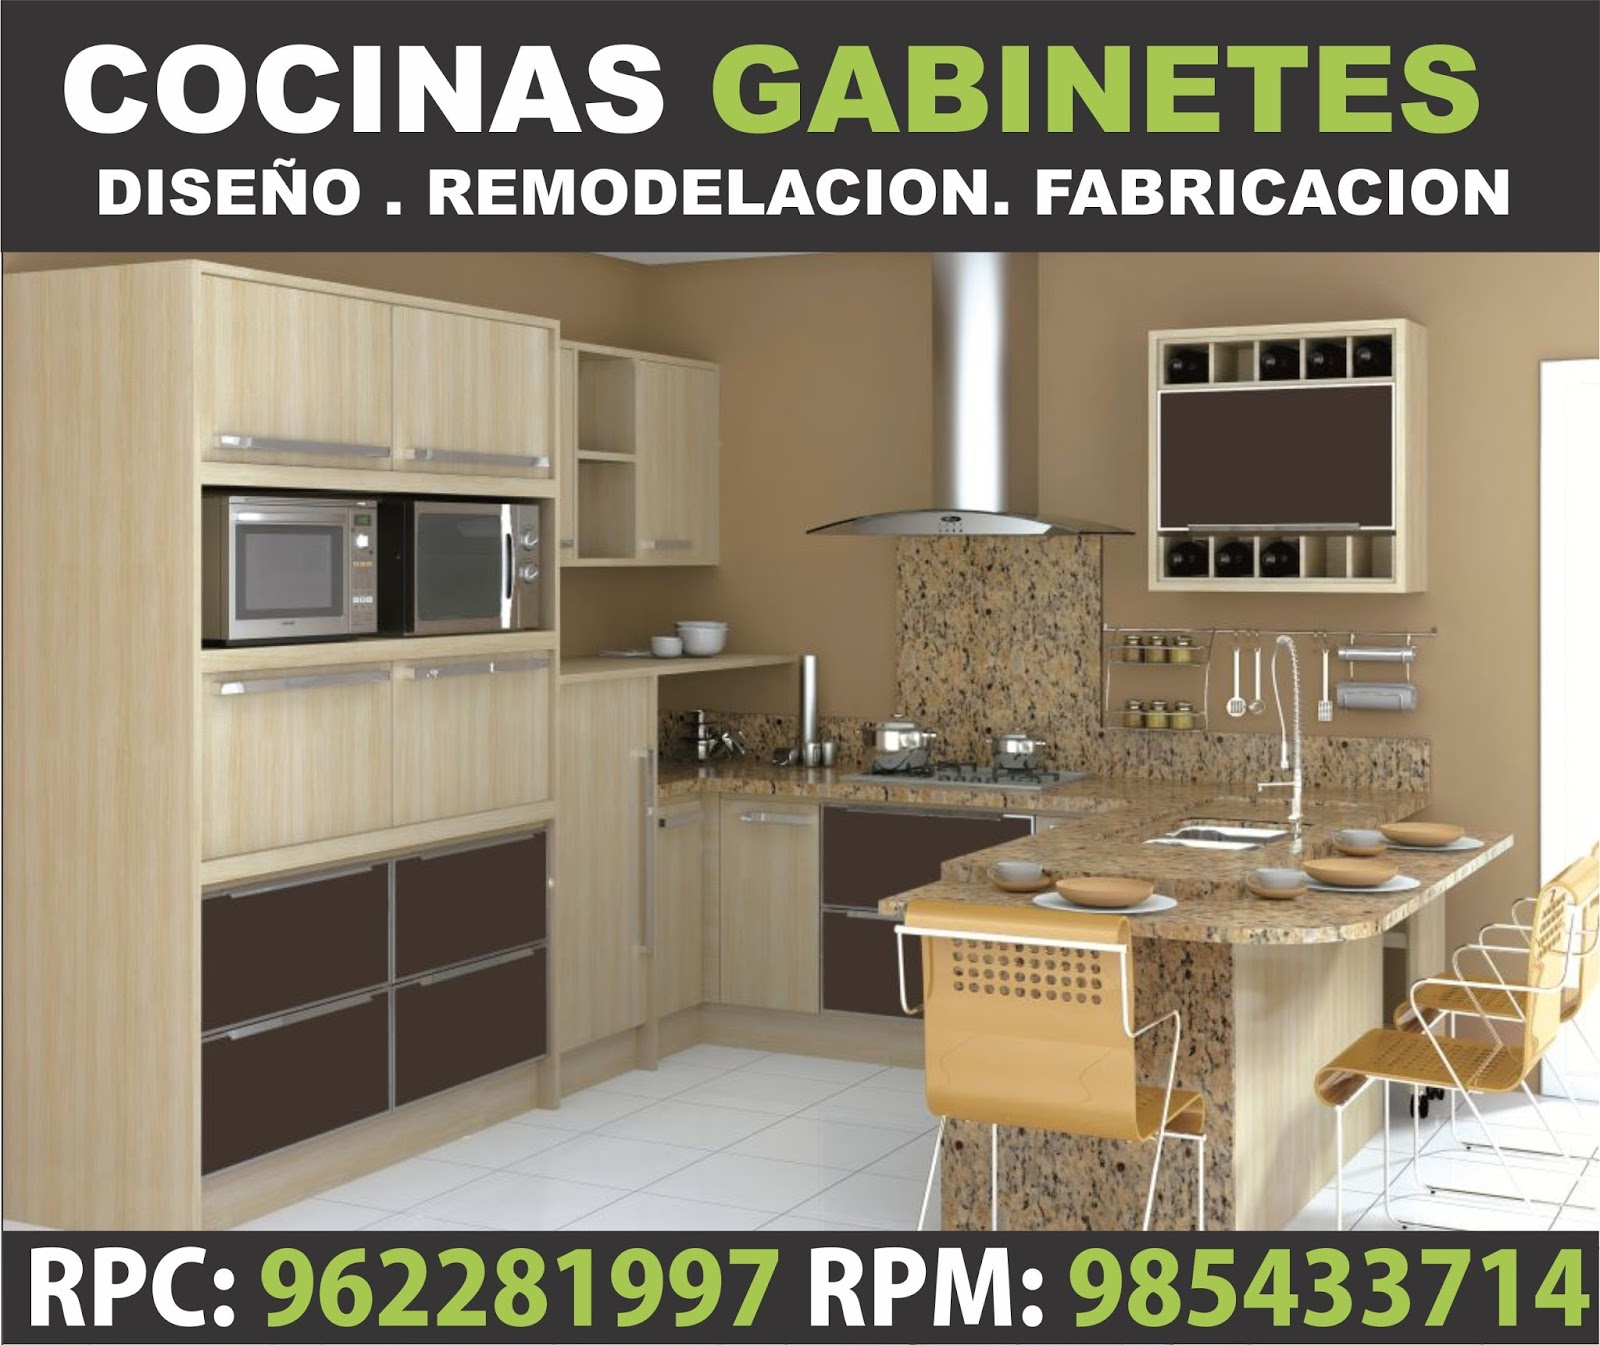 Dise os fabricacion de closet cocina y muebles de oficina for Cocinas hergom catalogo